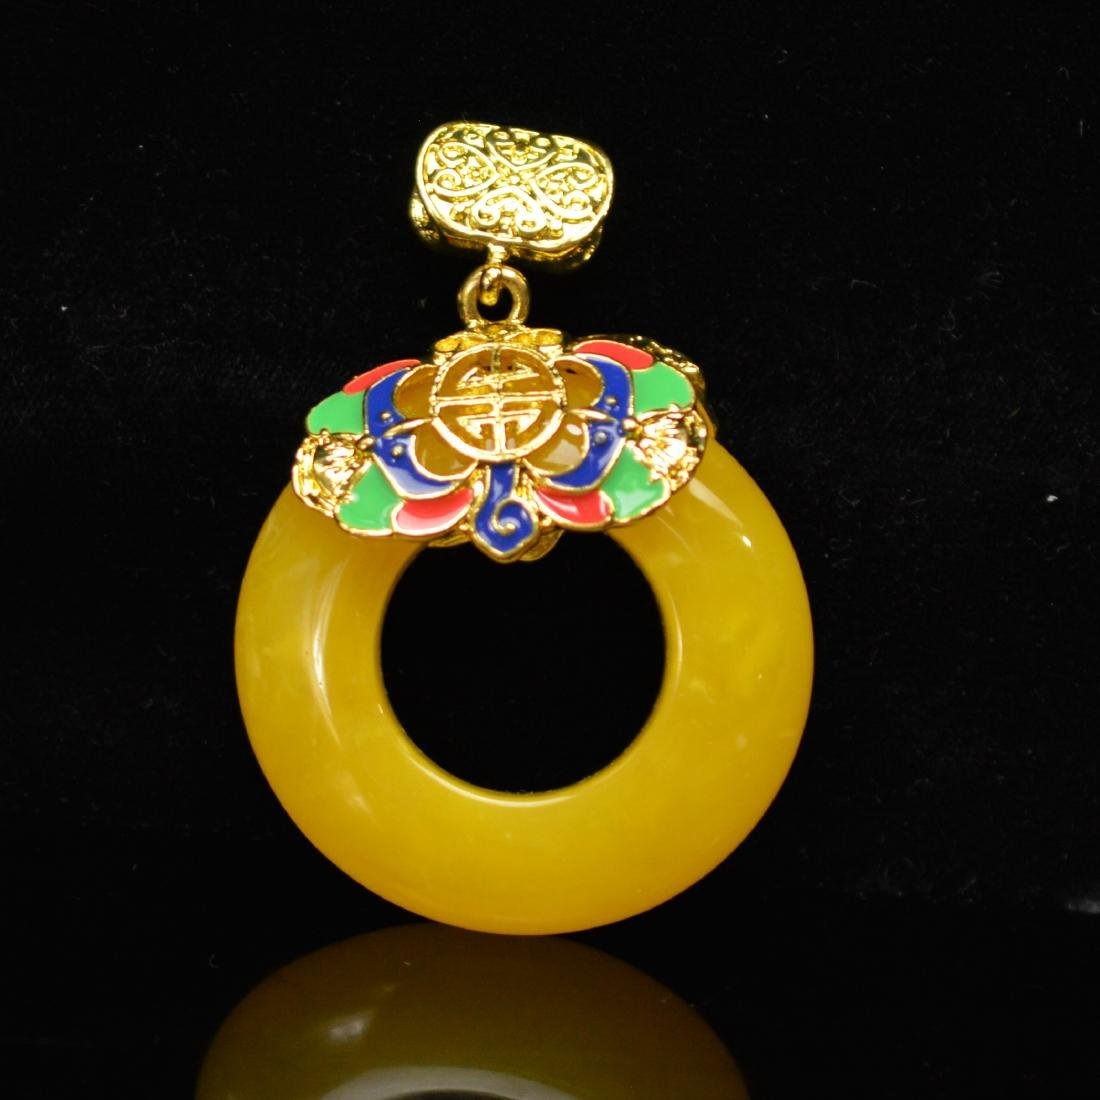 Royal Amber Faience pandent